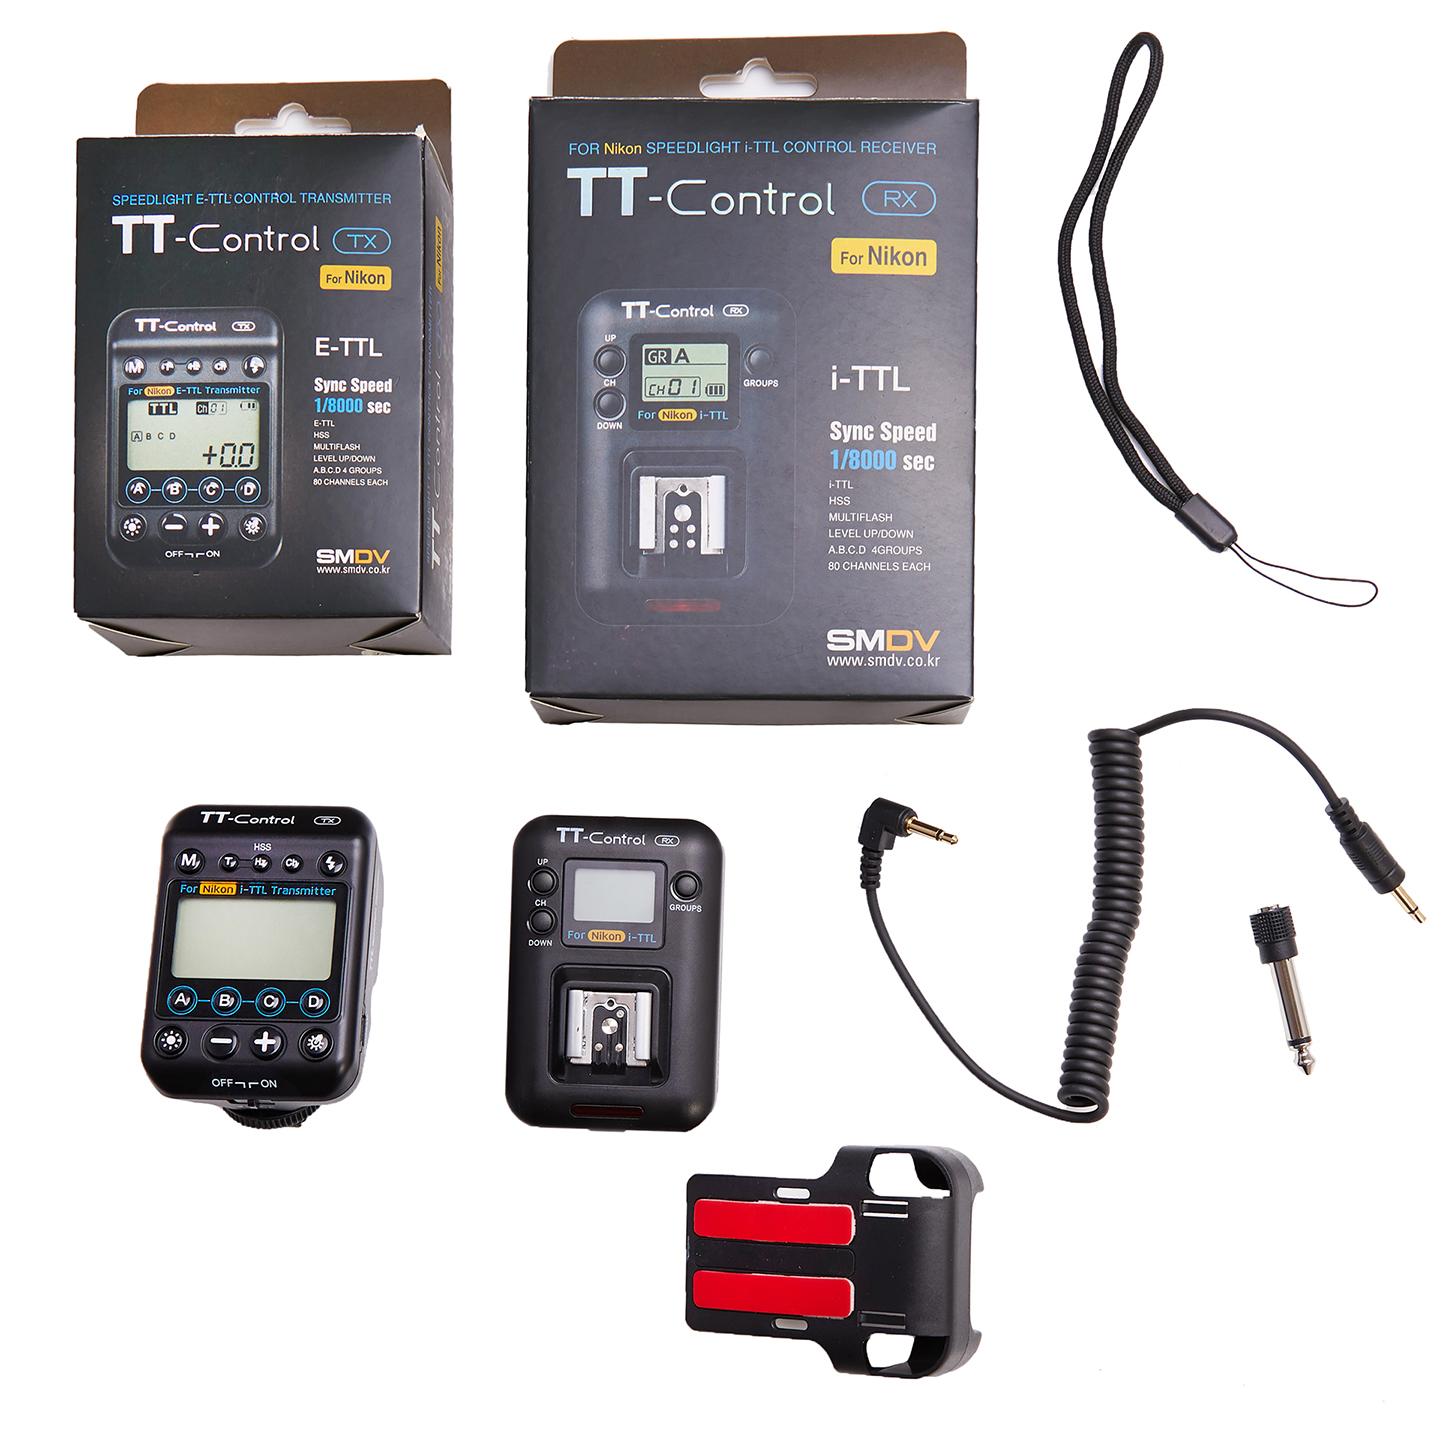 SMDV TTL-Control 閃燈觸發器(Canon)